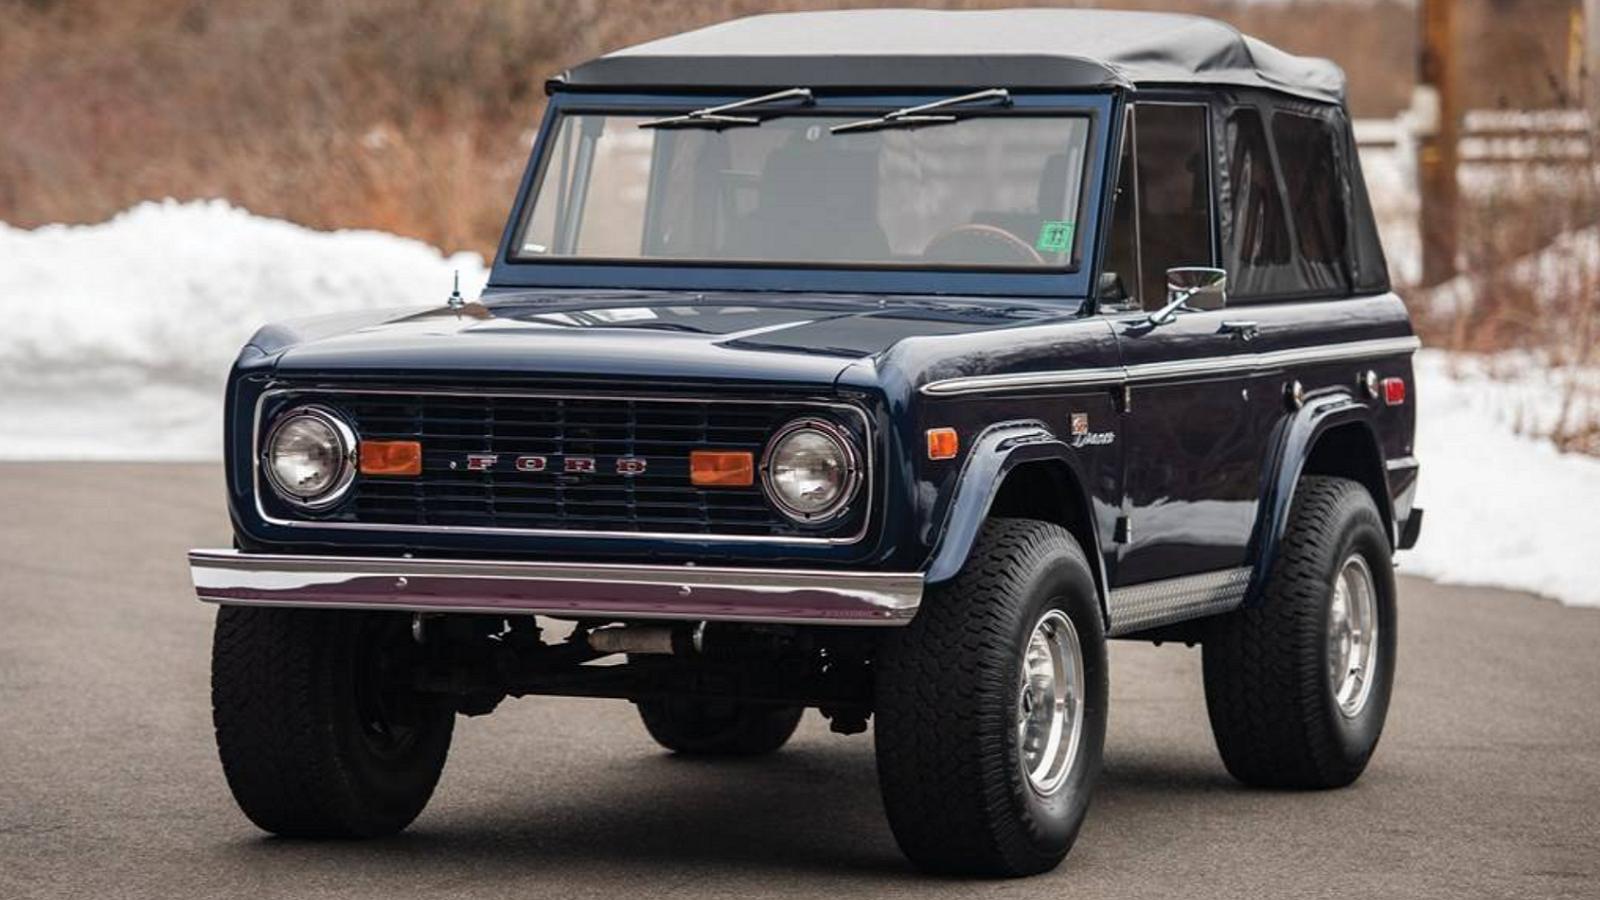 1975 Ford Bronco Is One Tastefully Done Restomod